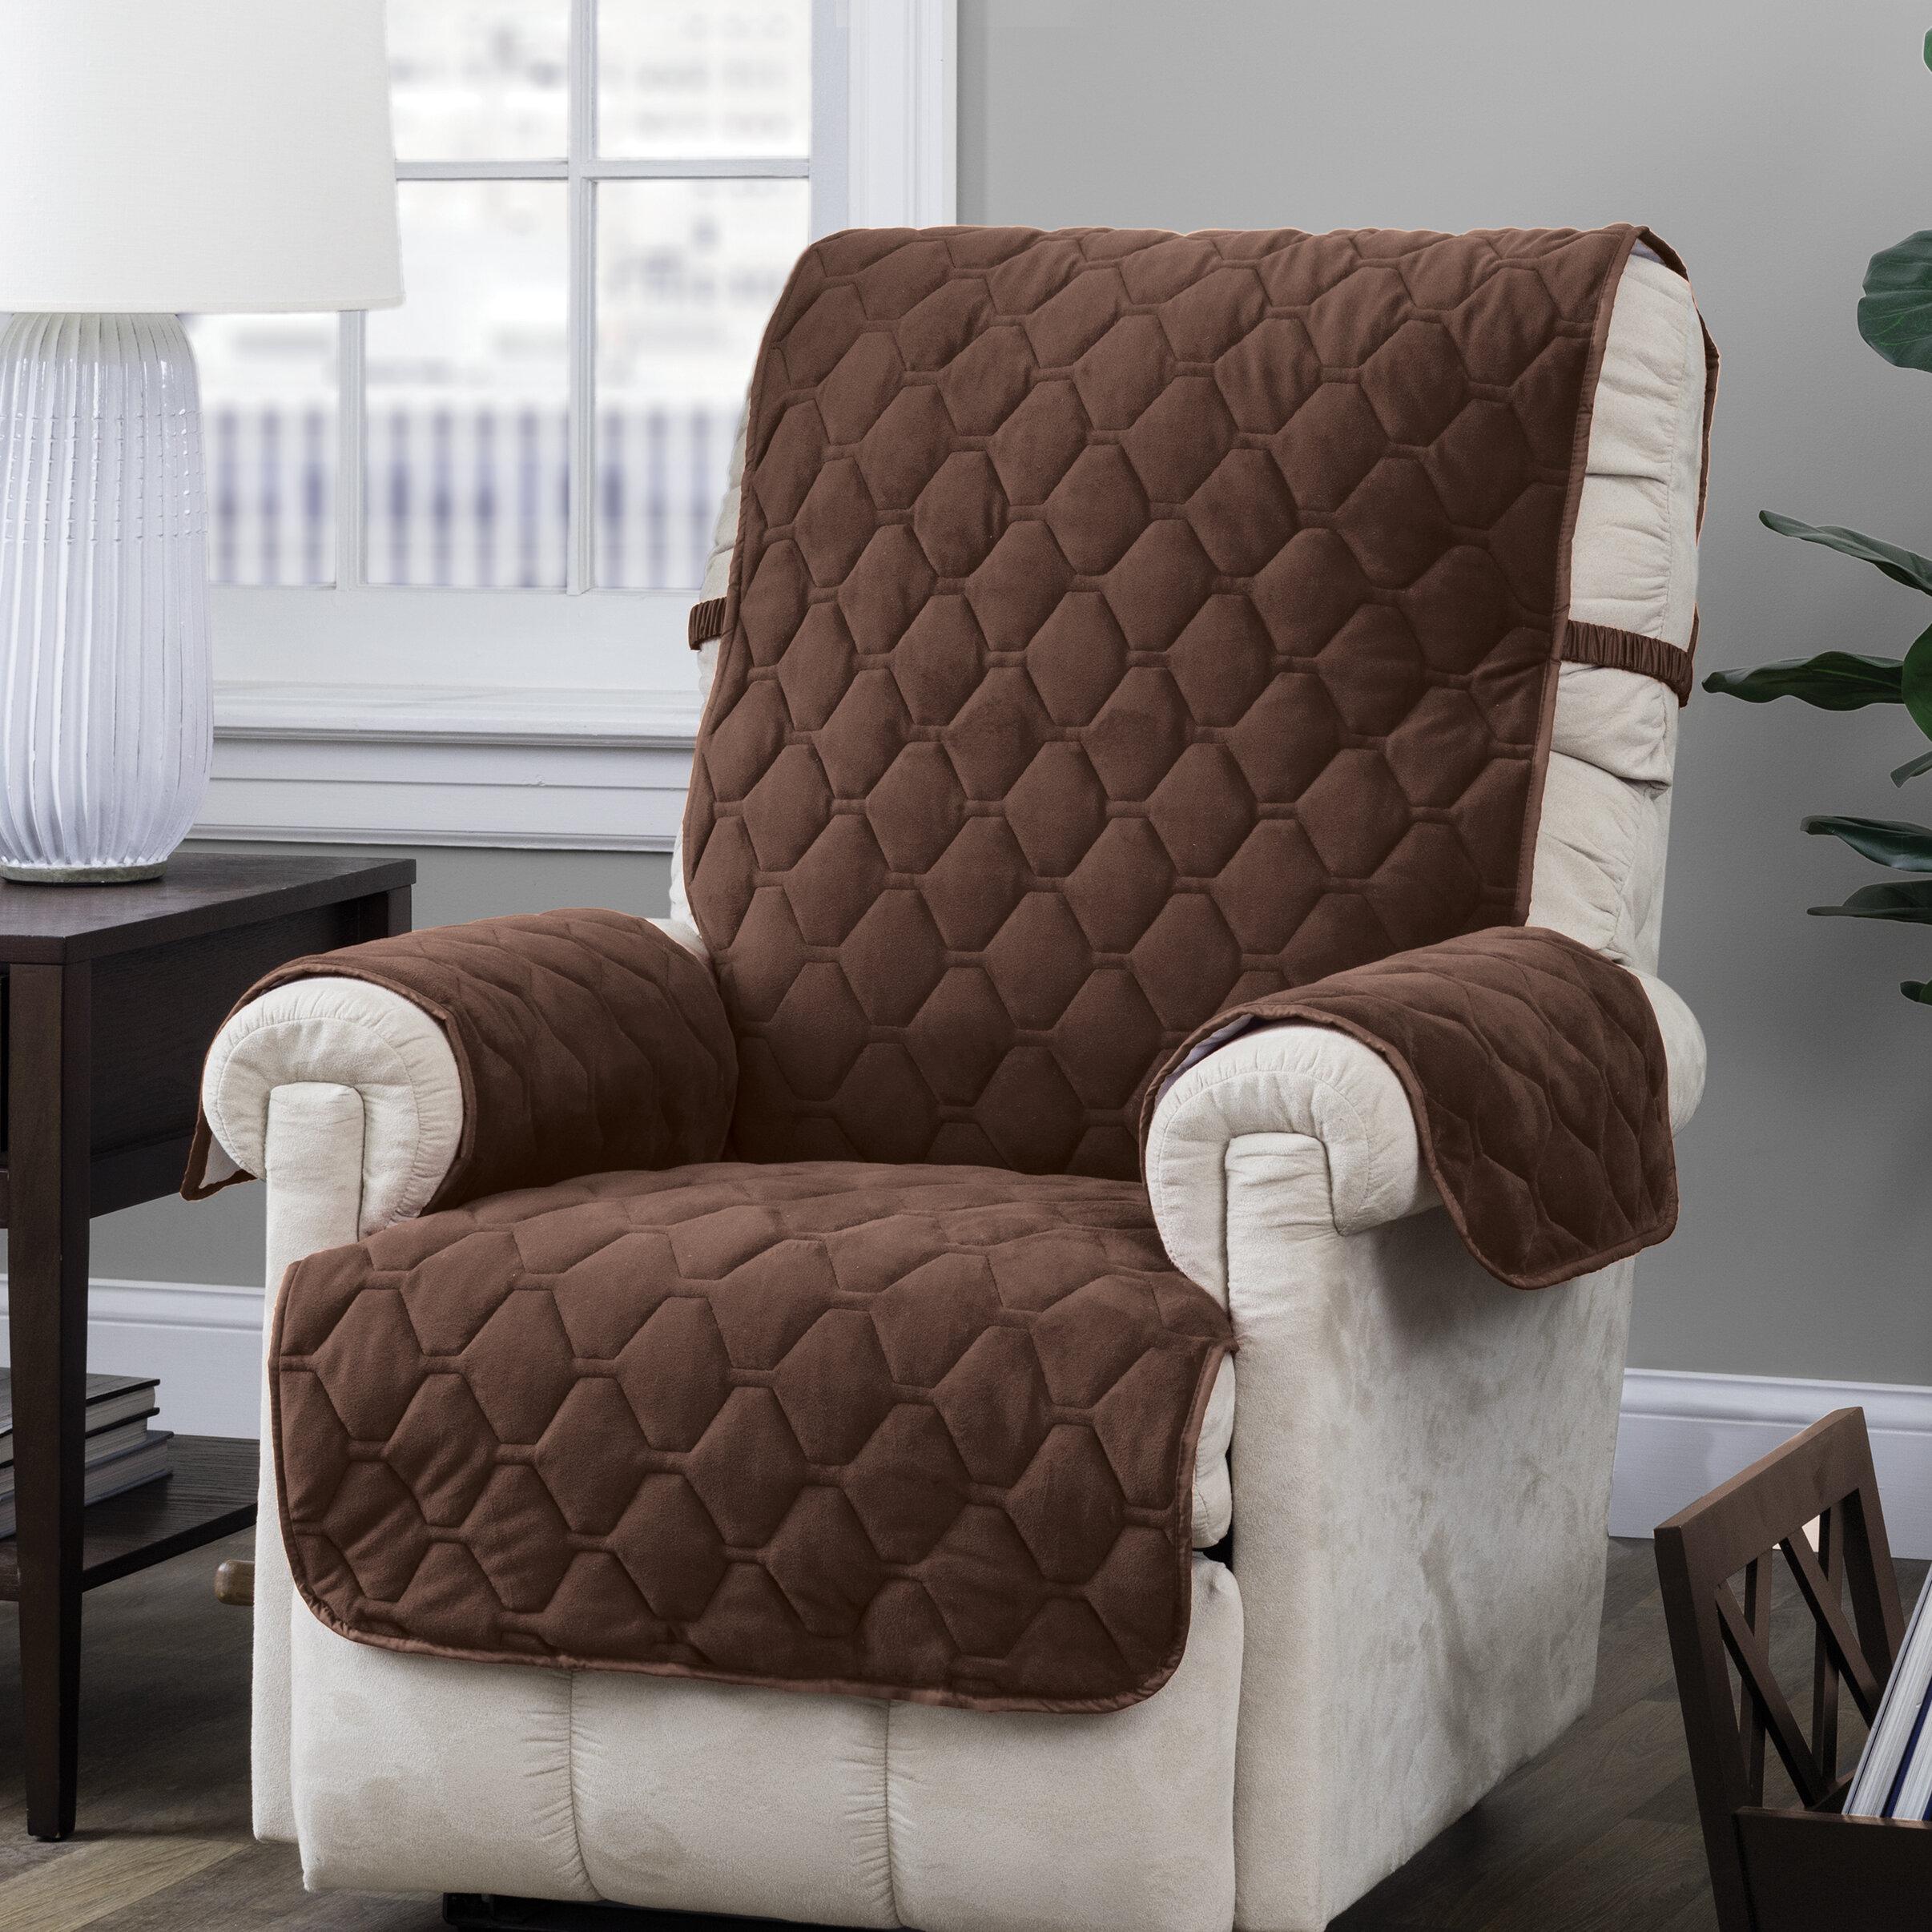 Beach Towel Chair Covers | Wayfair